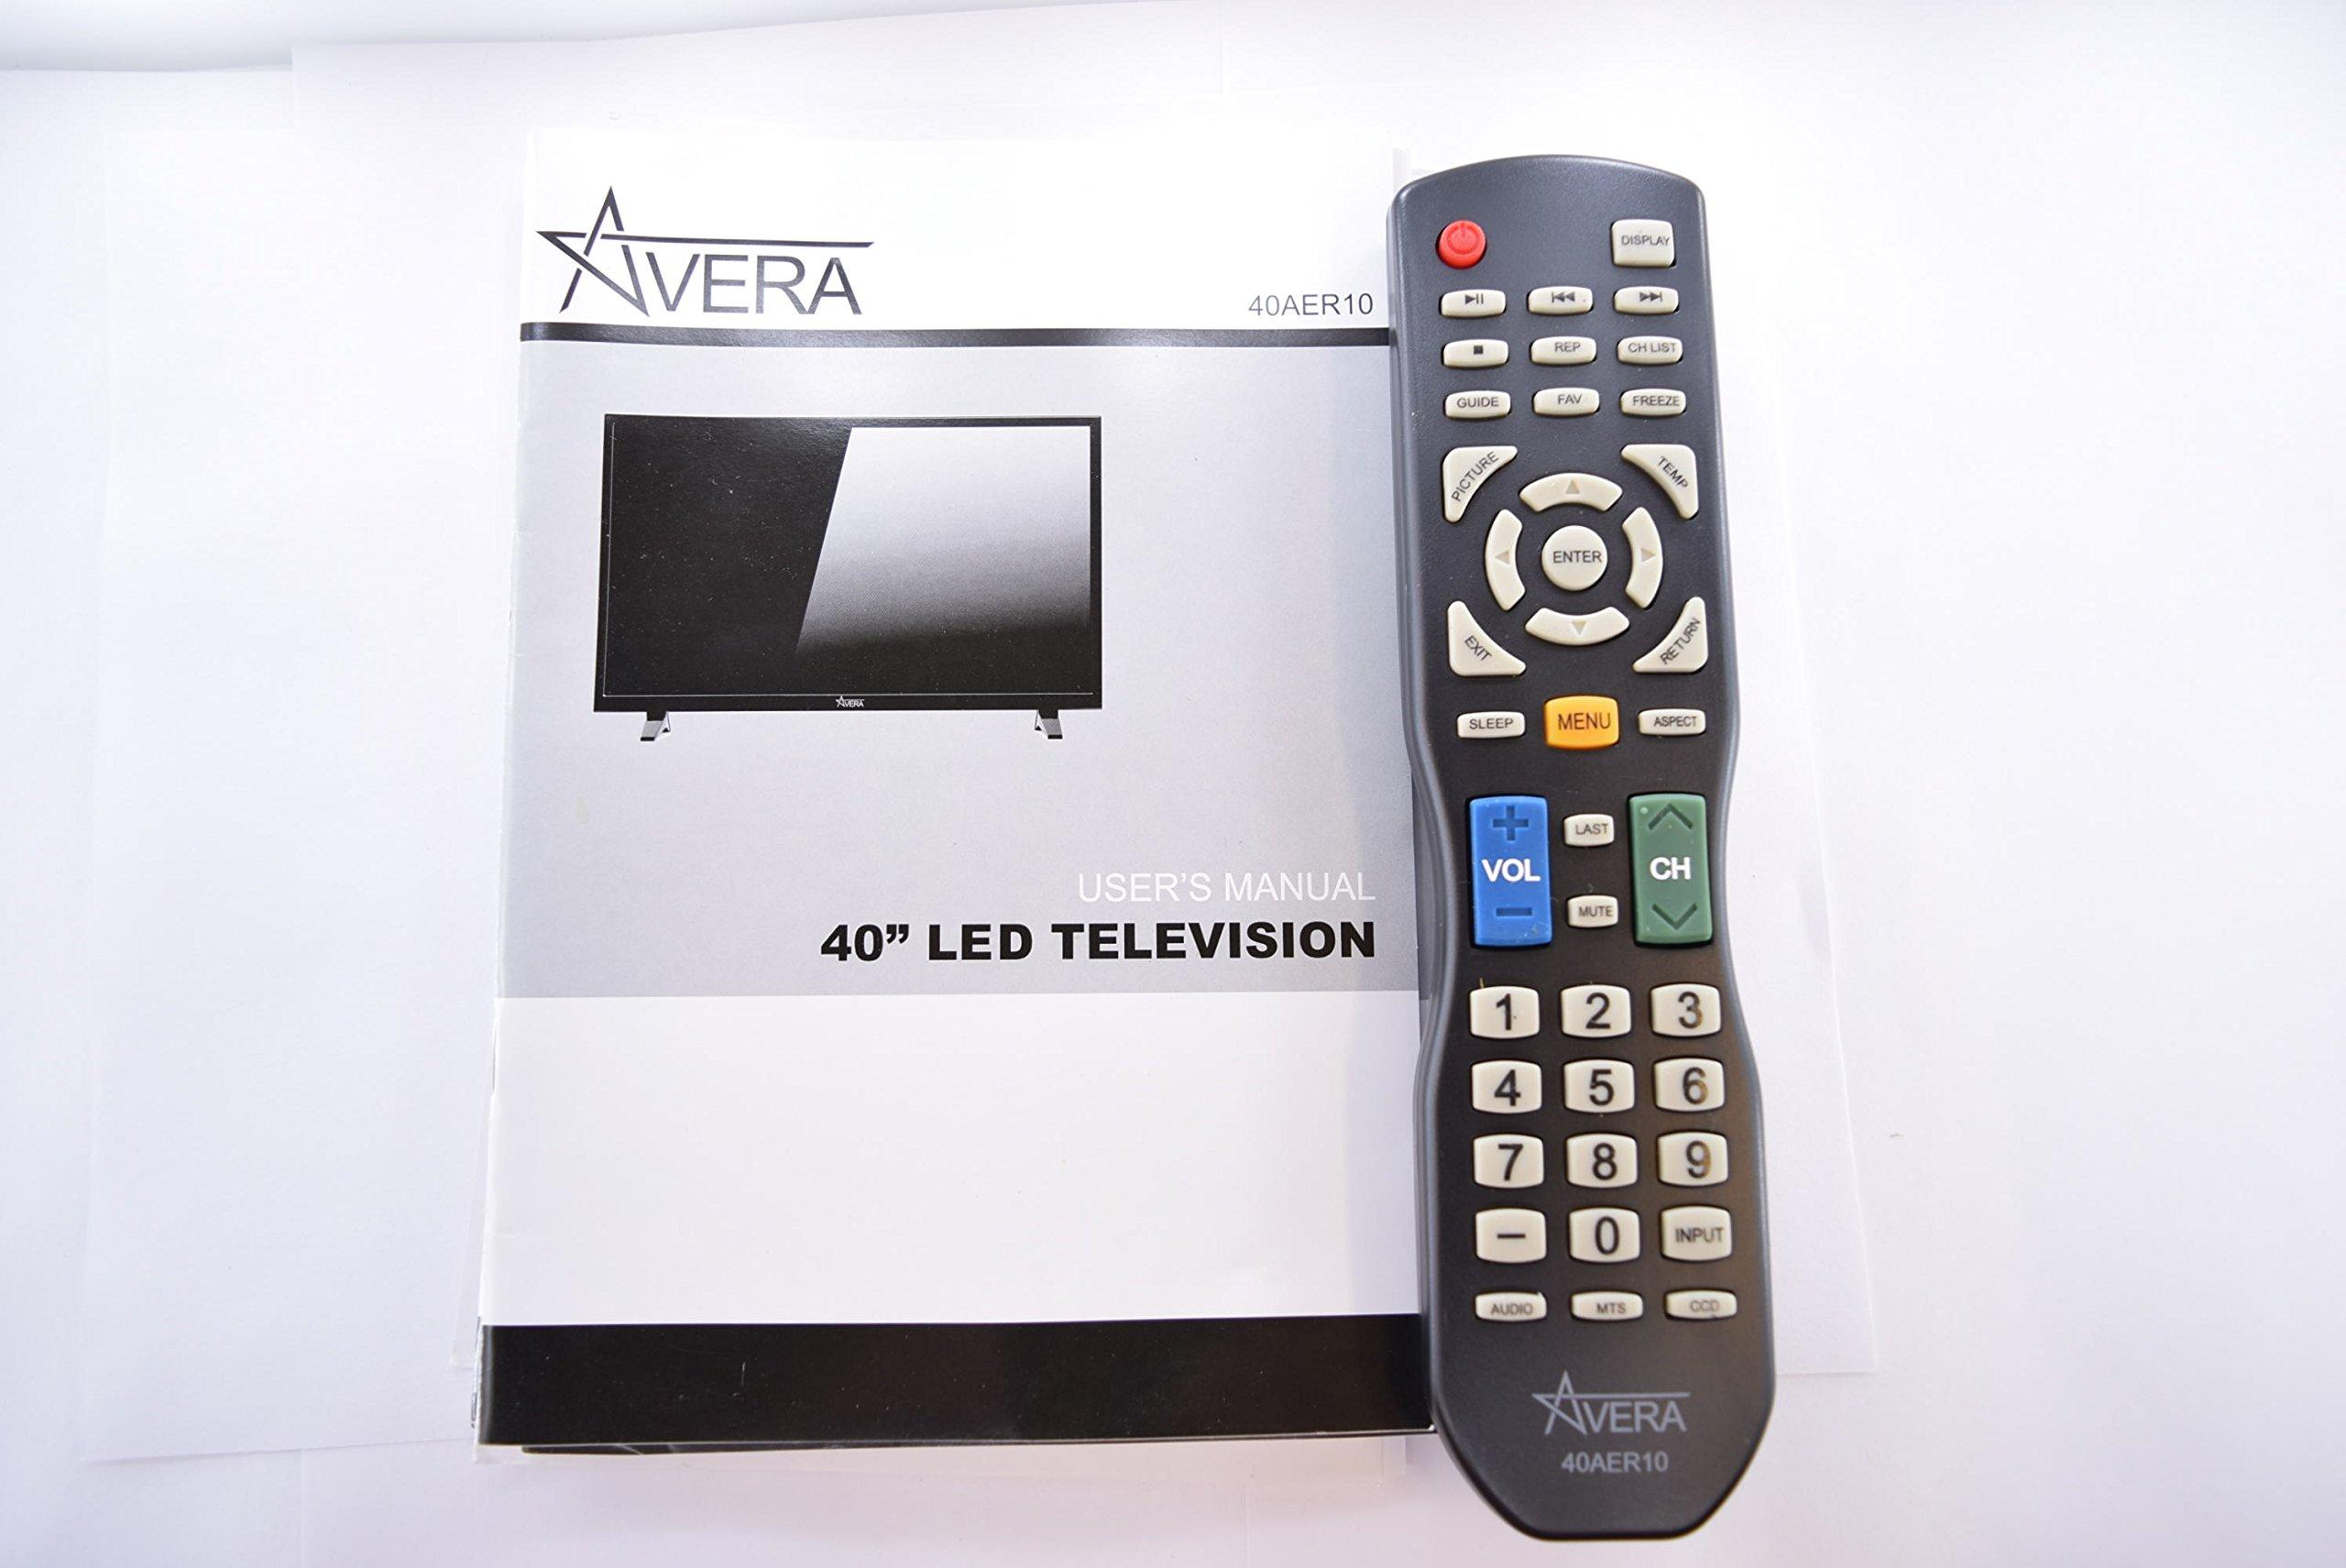 AVERA 40AER10 40AER10N TV REMOTE CONTROL AND USER MANUAL 20433